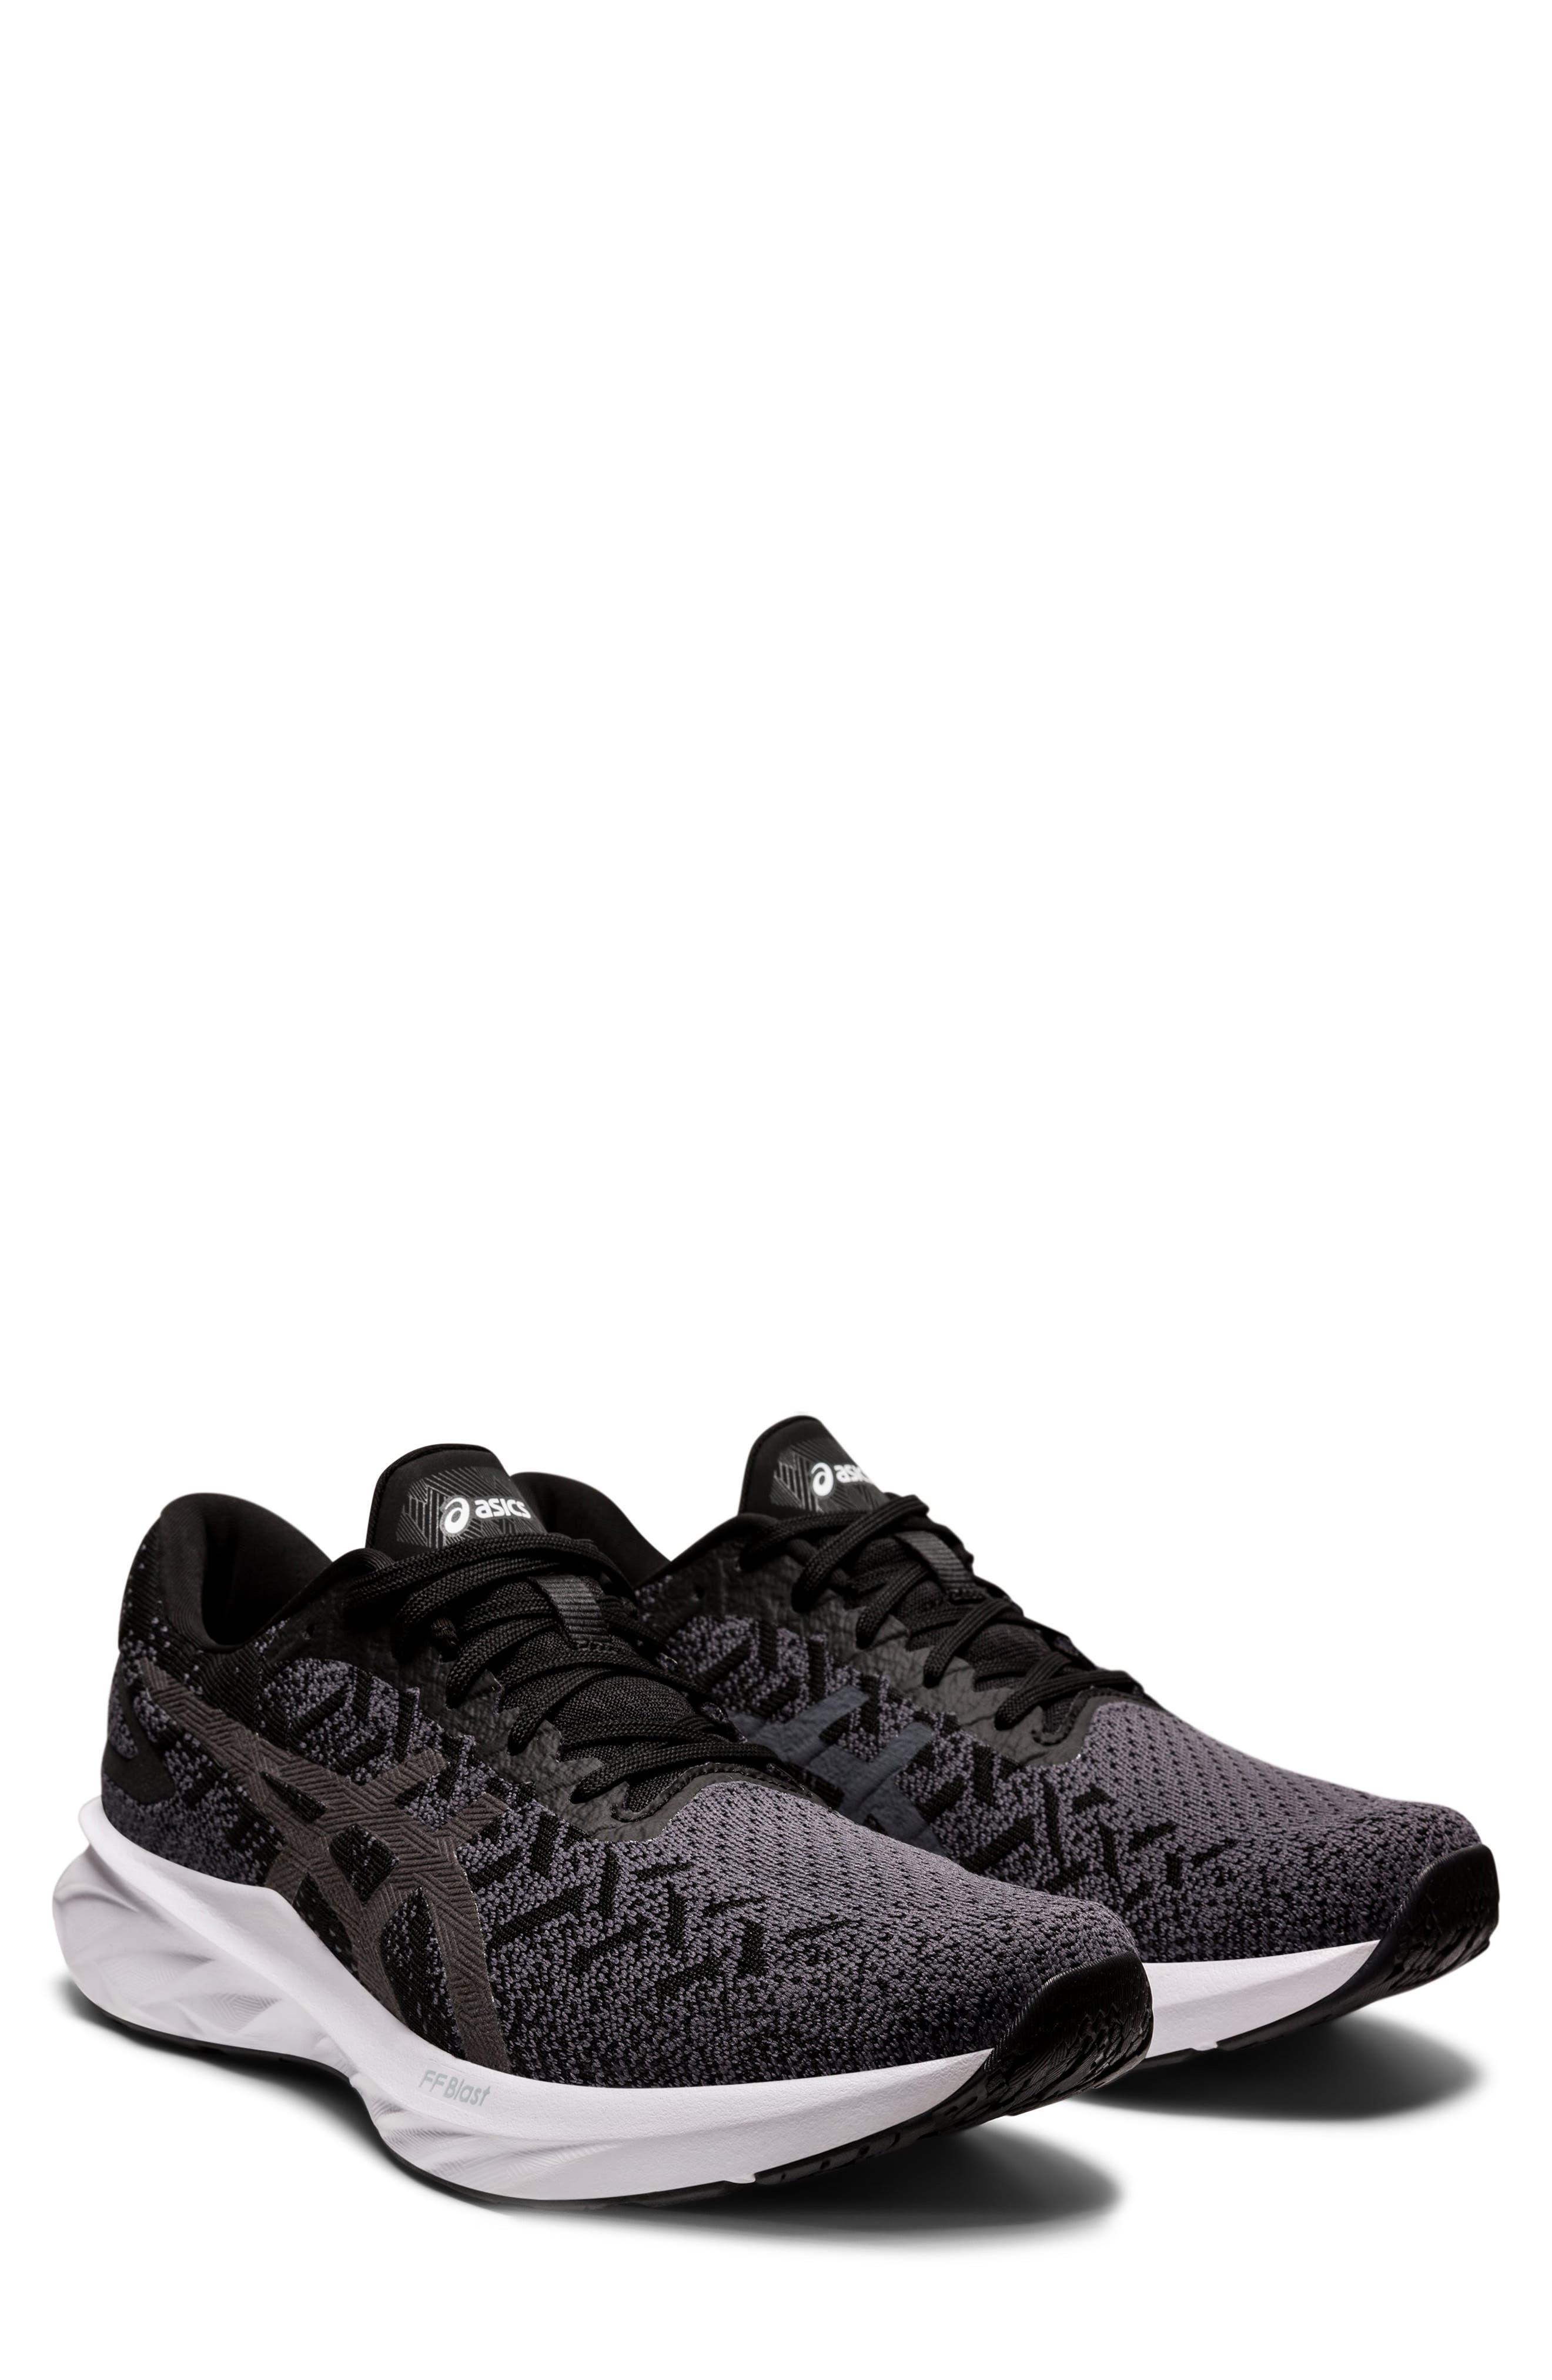 Men's Asics Dynablast 2 Running Shoe